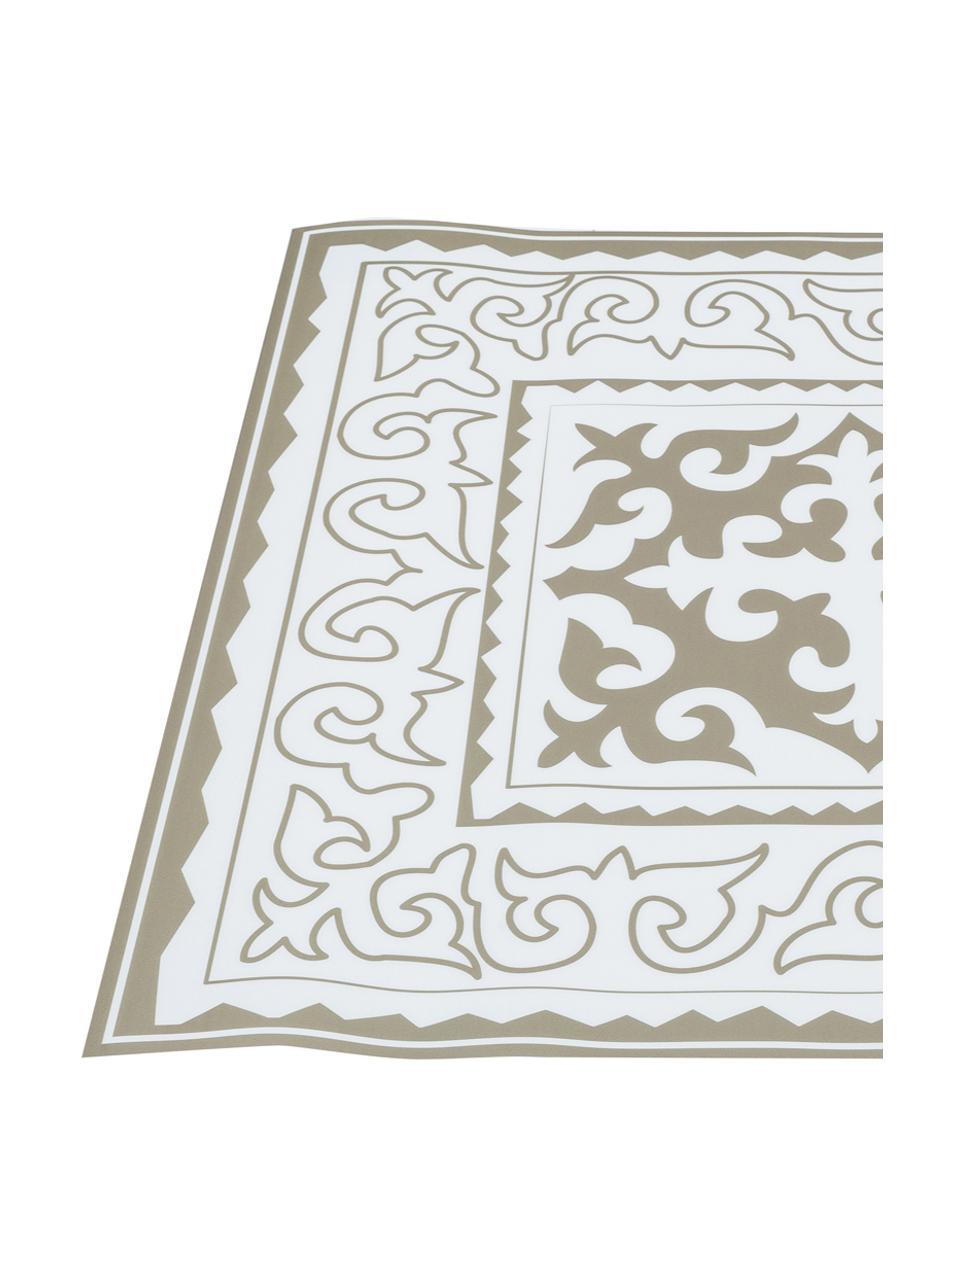 Tappetino antiscivolo taupe/bianco in vinile Aksana, Vinile riciclabile, Bianco, taupe, Larg. 136 x Lung. 203 cm